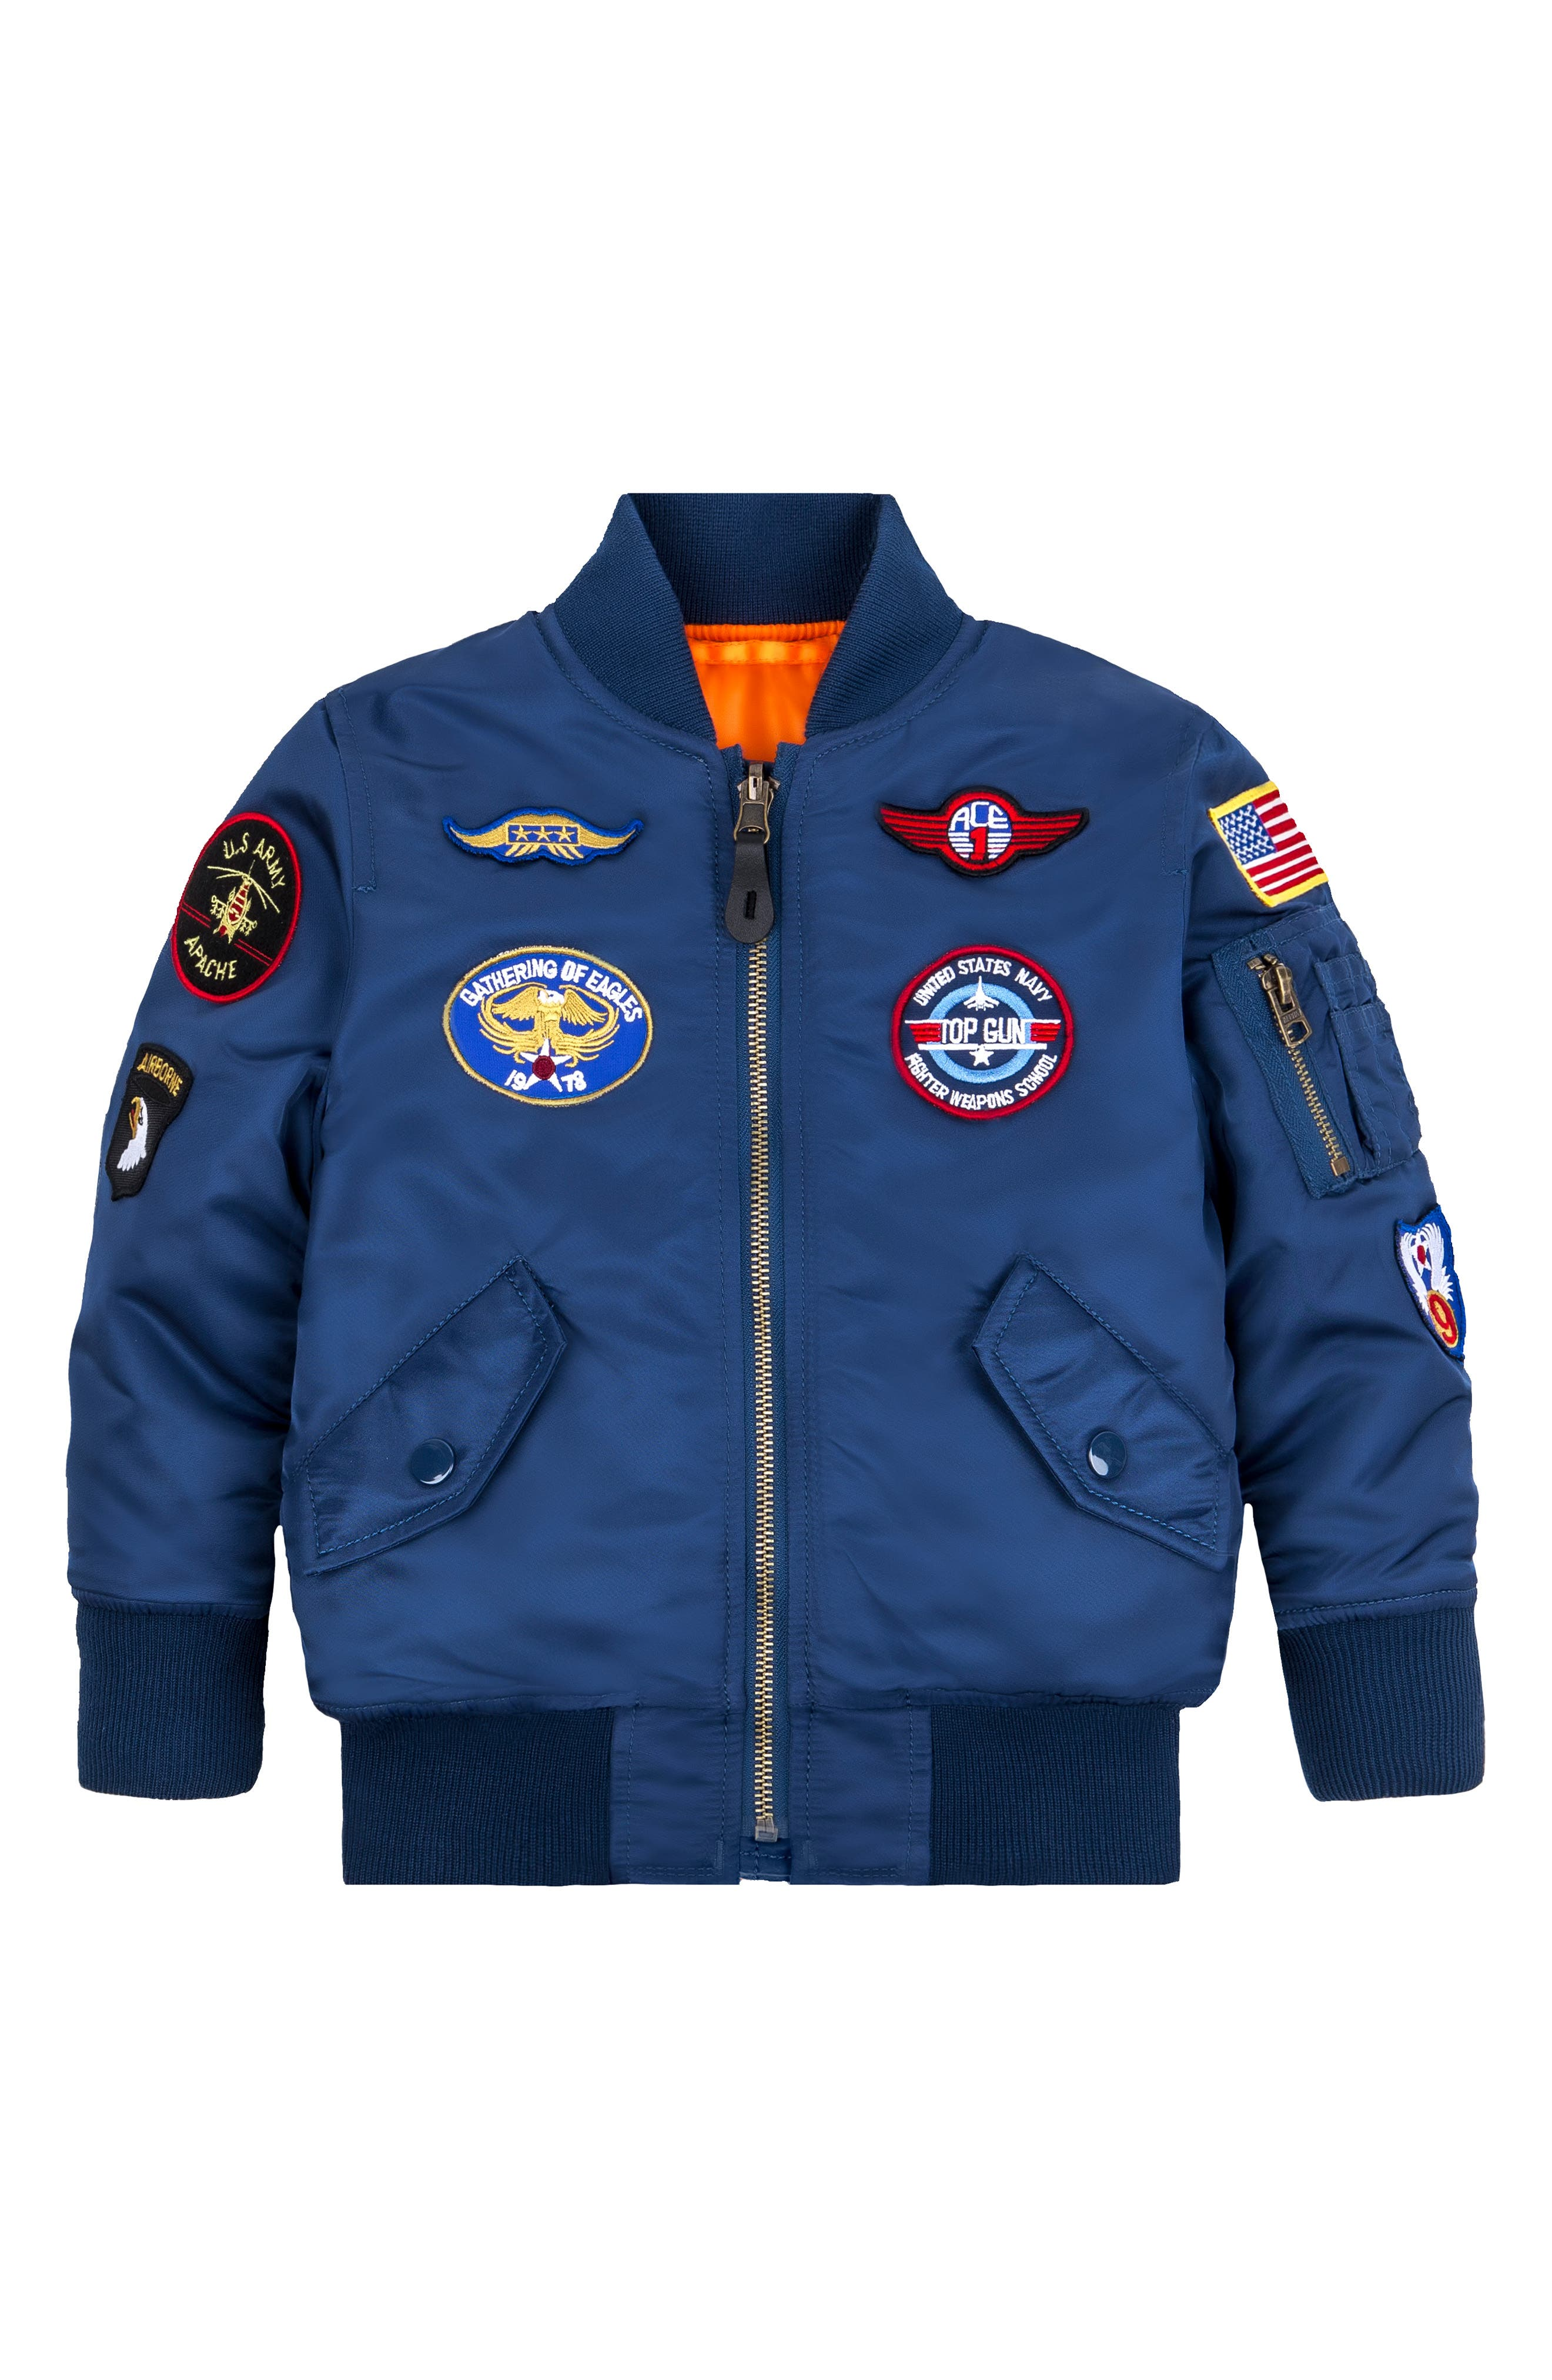 MA-1 Patch Flight Jacket,                         Main,                         color, BLUE NO 9